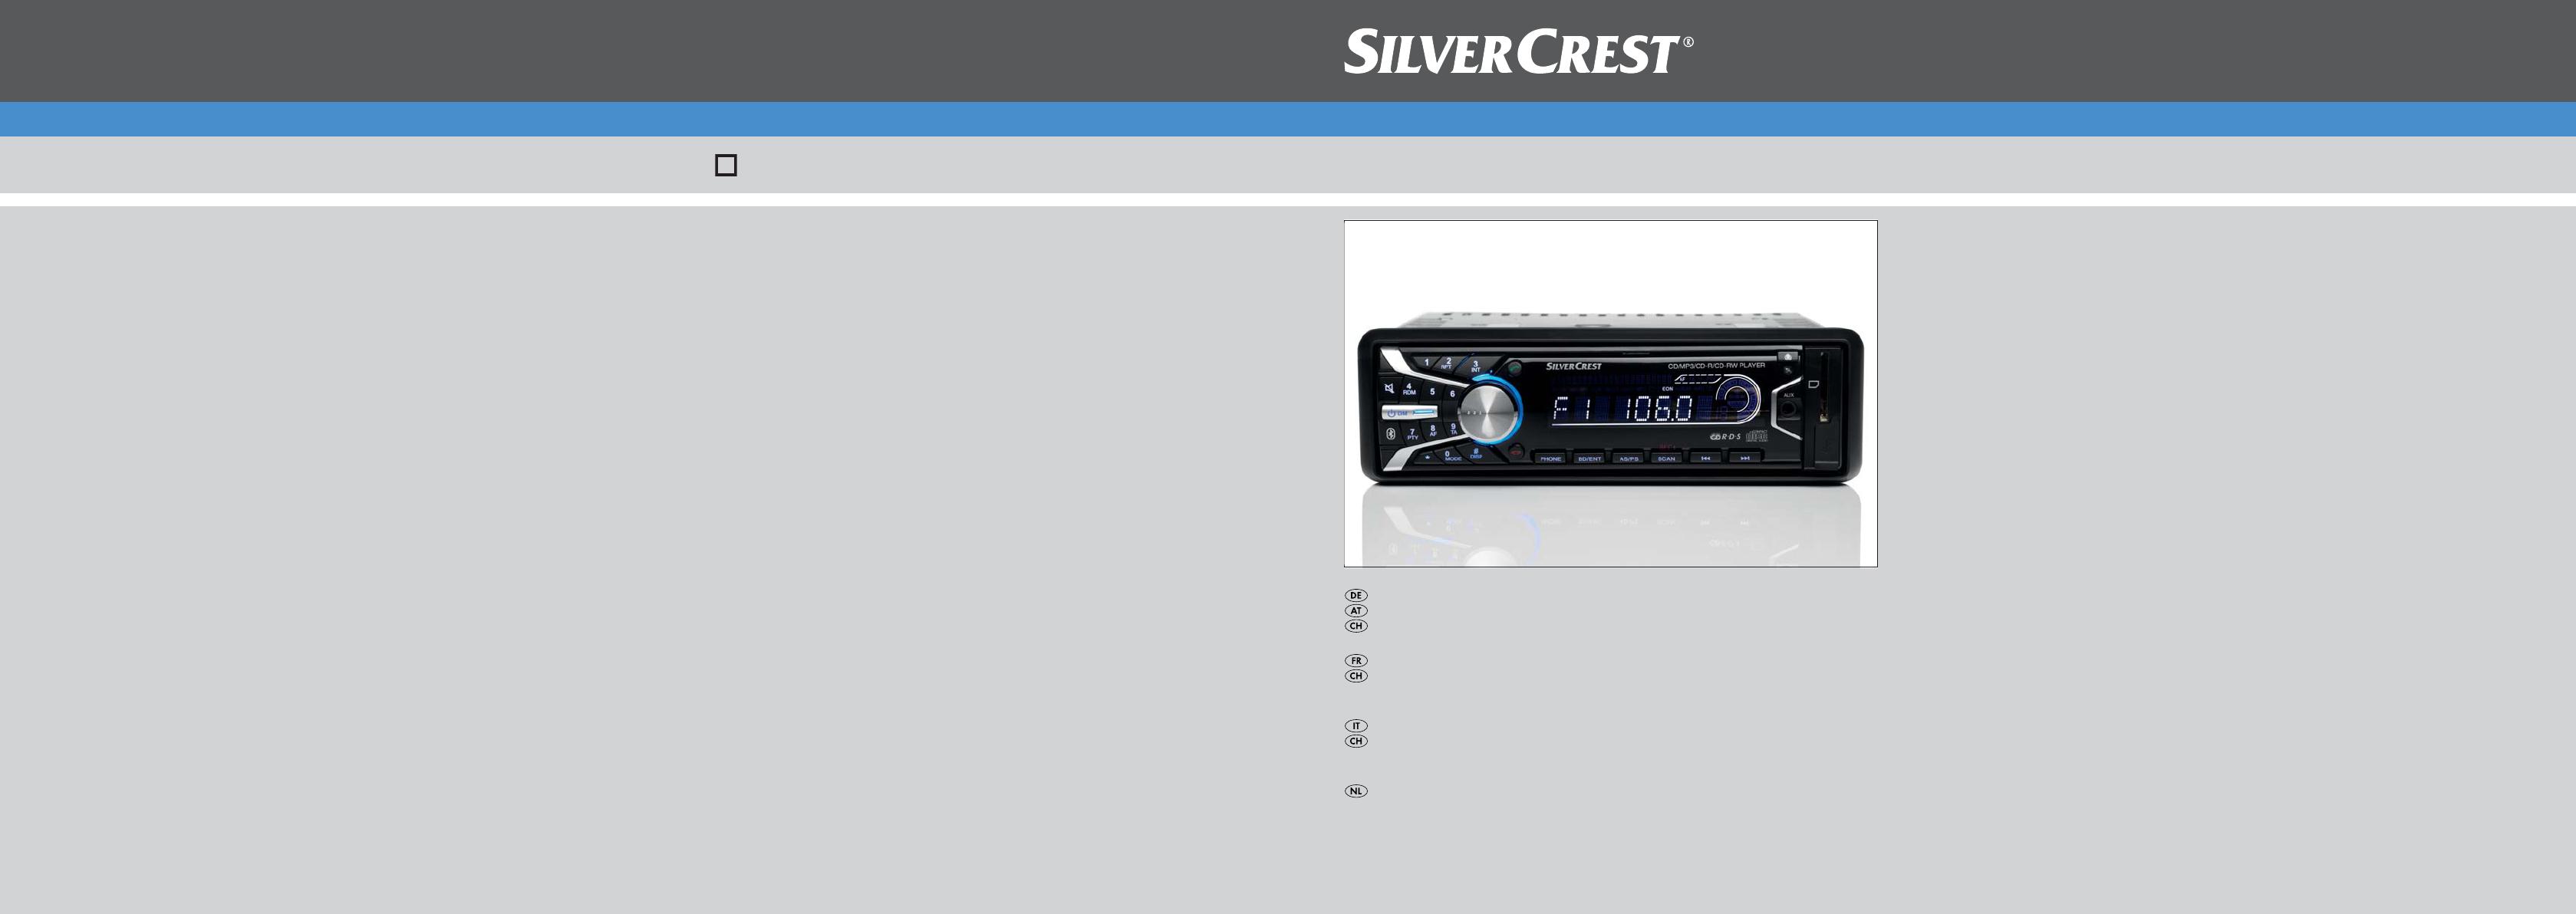 Handleiding Silvercrest SAB 160 A1 - IAN 66837 (pagina 1 van 162 ...